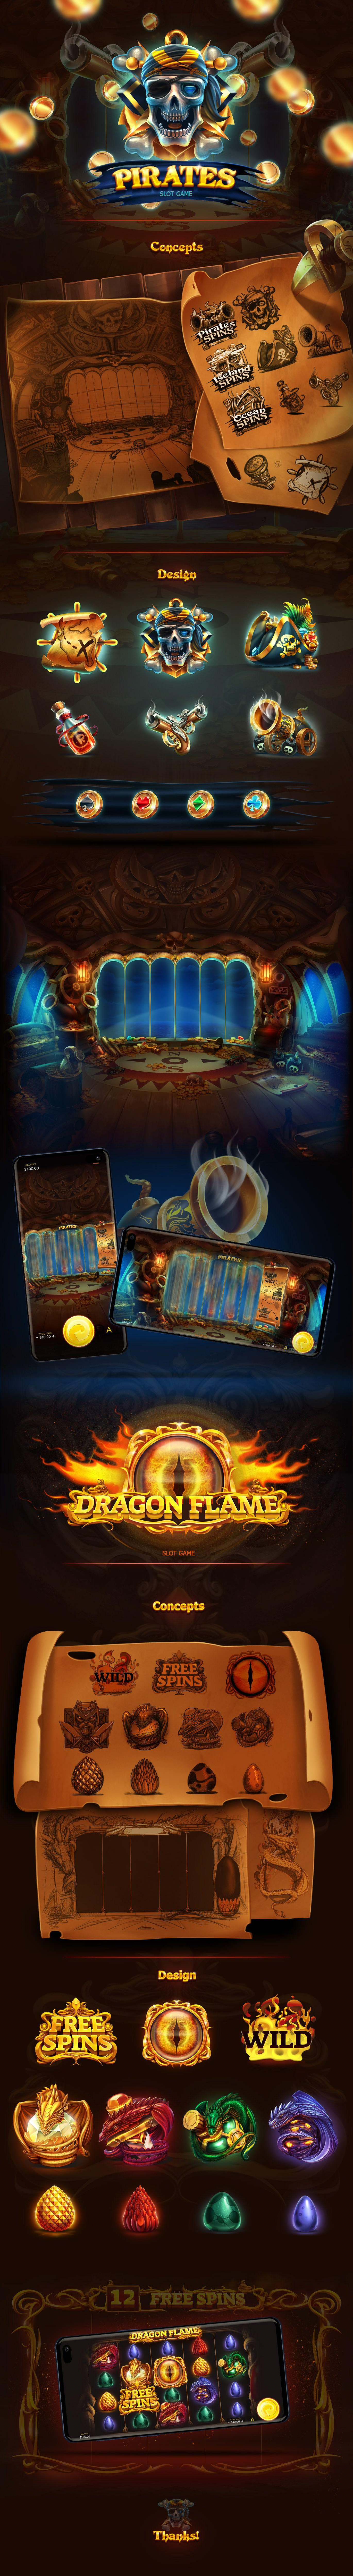 Behance For You Slot, Game design, Splash screen